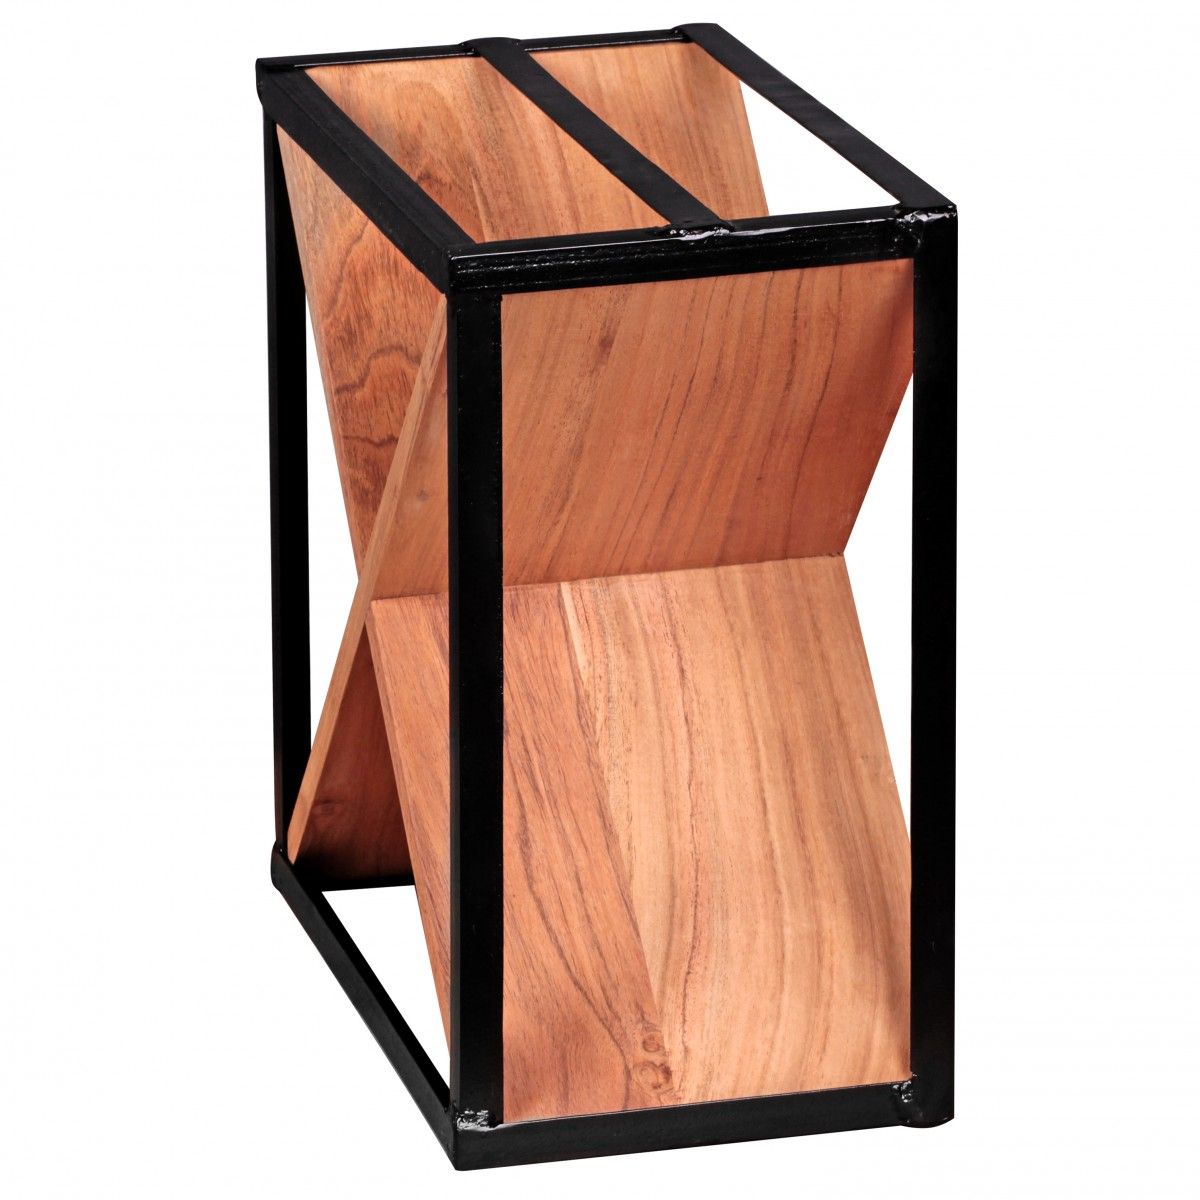 finebuy weinregal massiv holz flaschenregal design standregal f r ca 16 flaschen mit. Black Bedroom Furniture Sets. Home Design Ideas